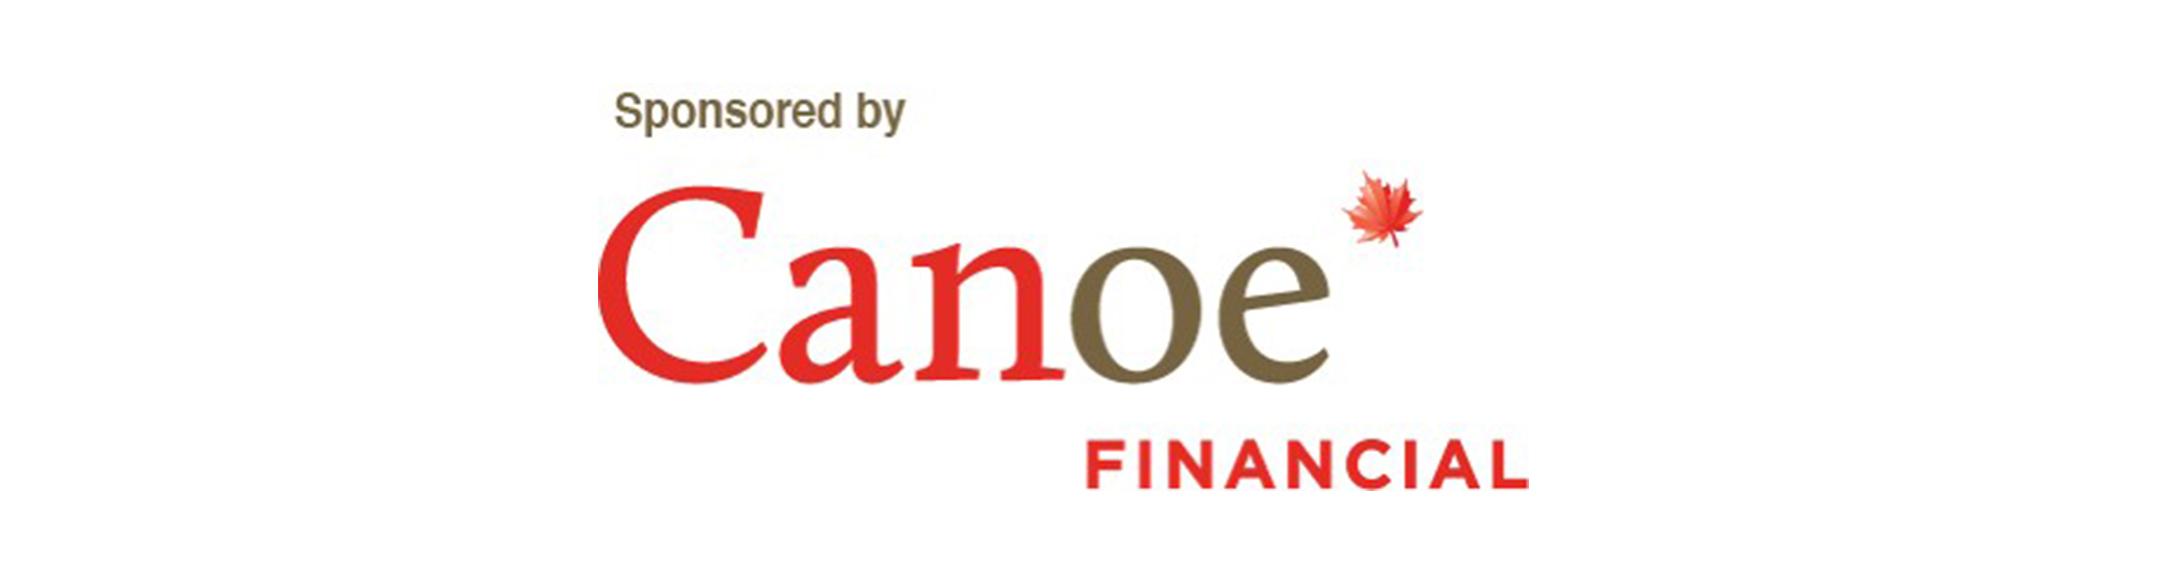 Title Sponsor, Canoe Financial Logo